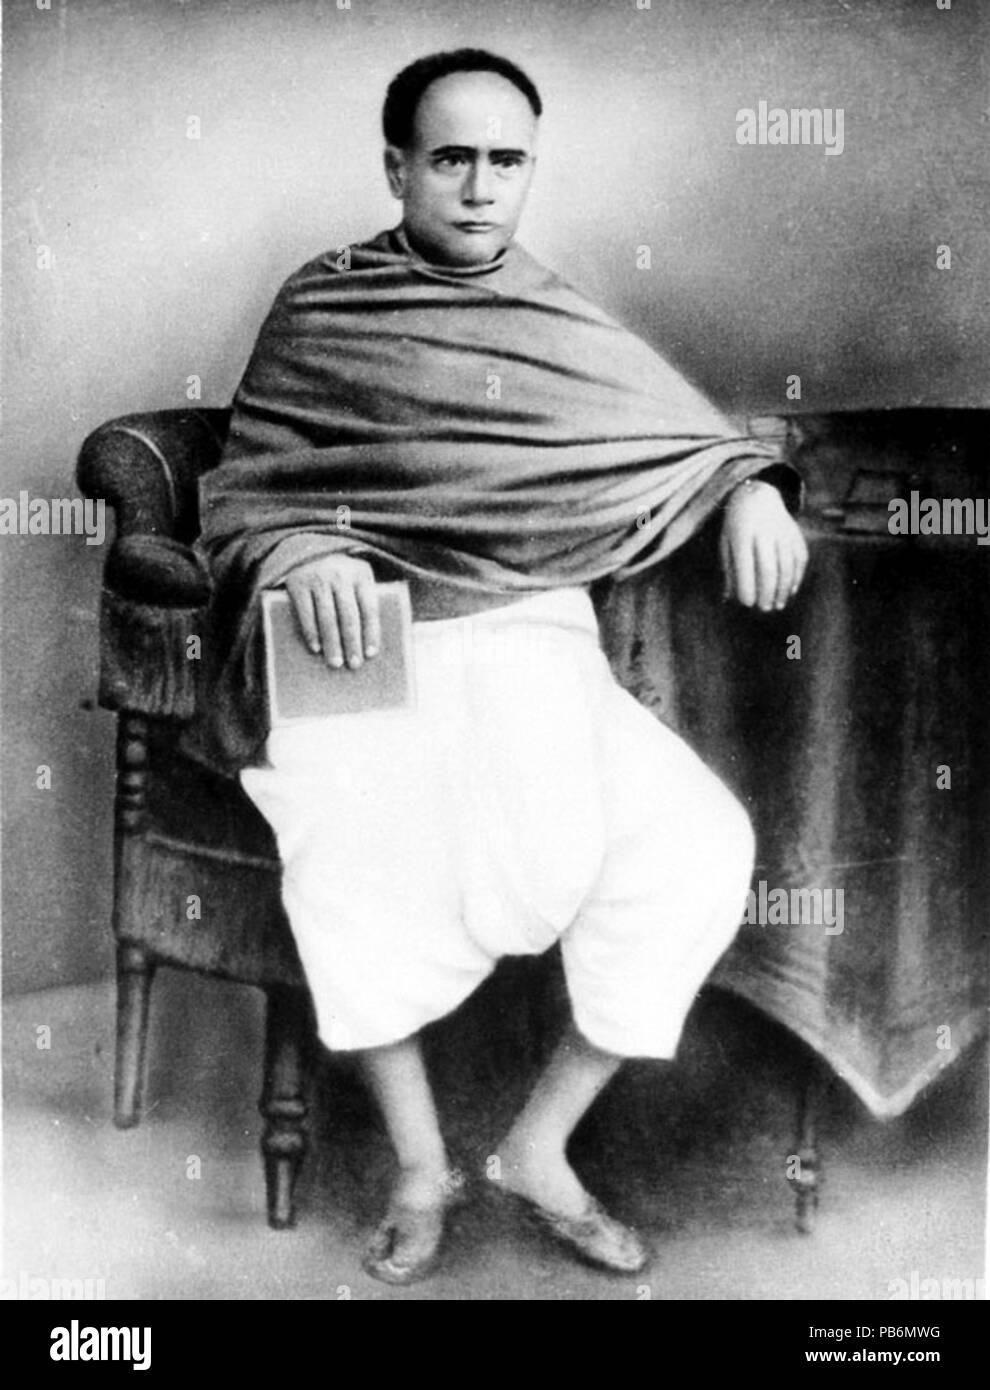 813 Ishwar Chandra Vidyasagar - Stock Image